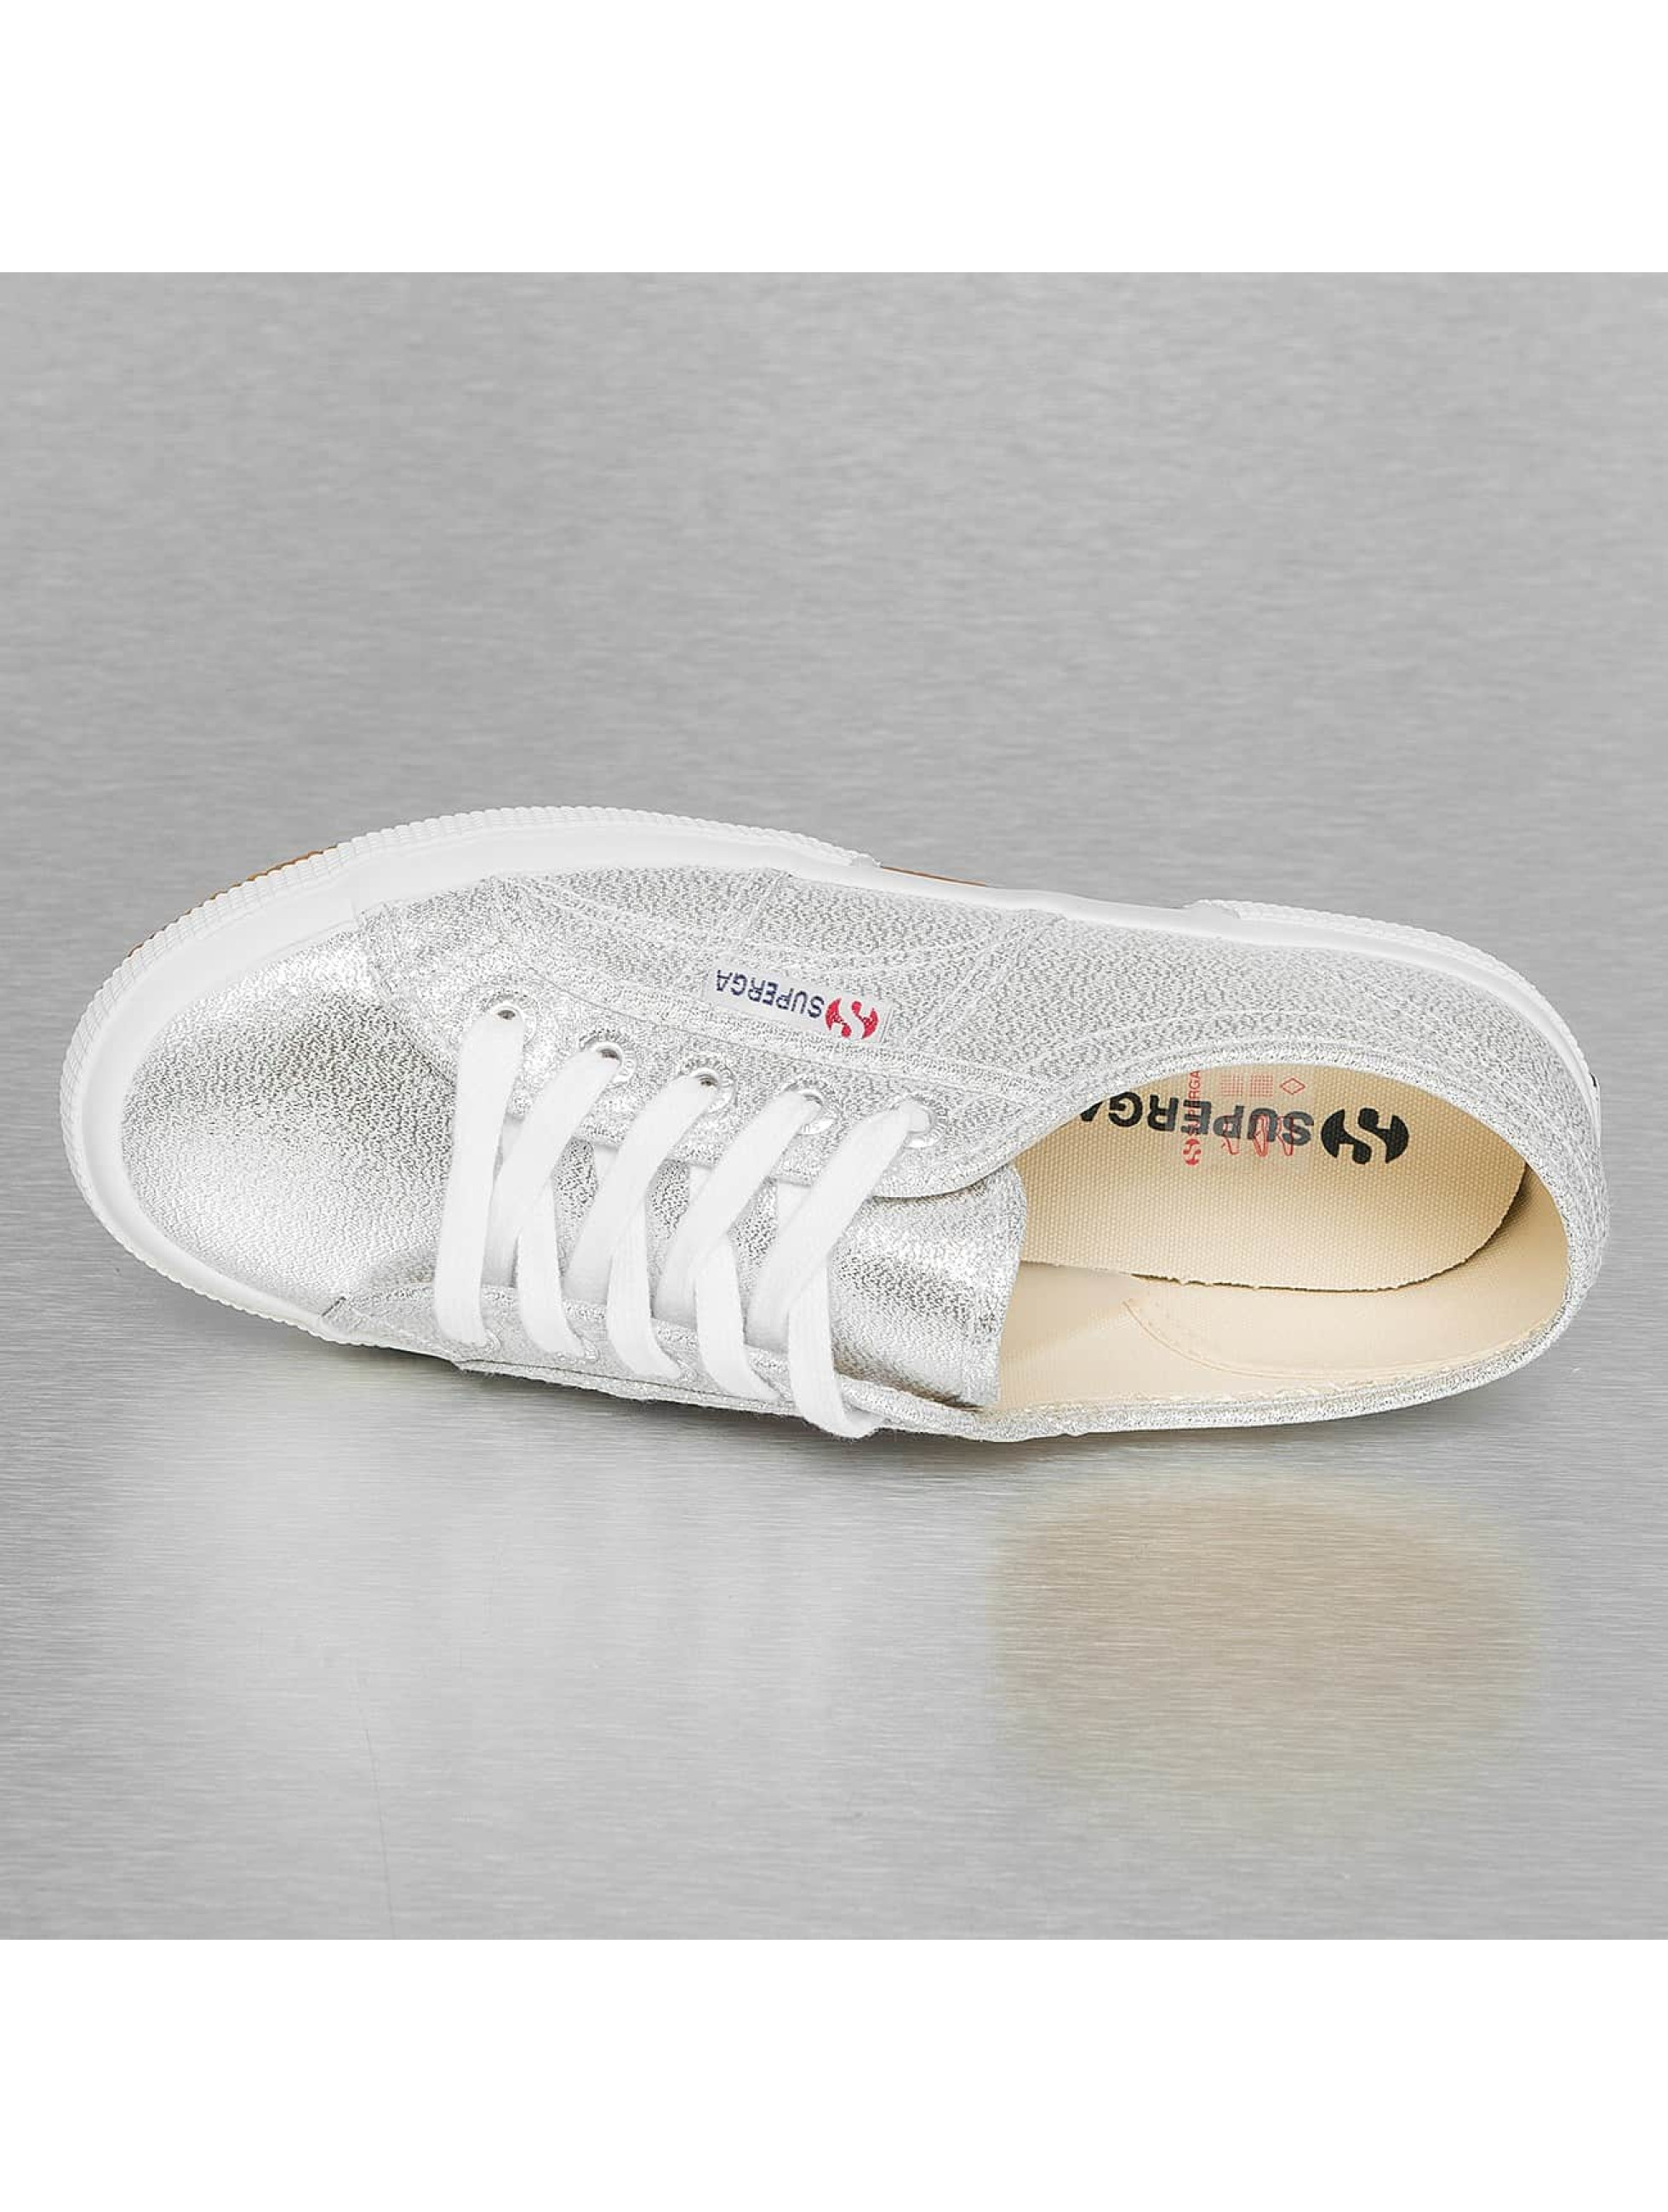 Superga Sneaker 2750 Lamew silberfarben